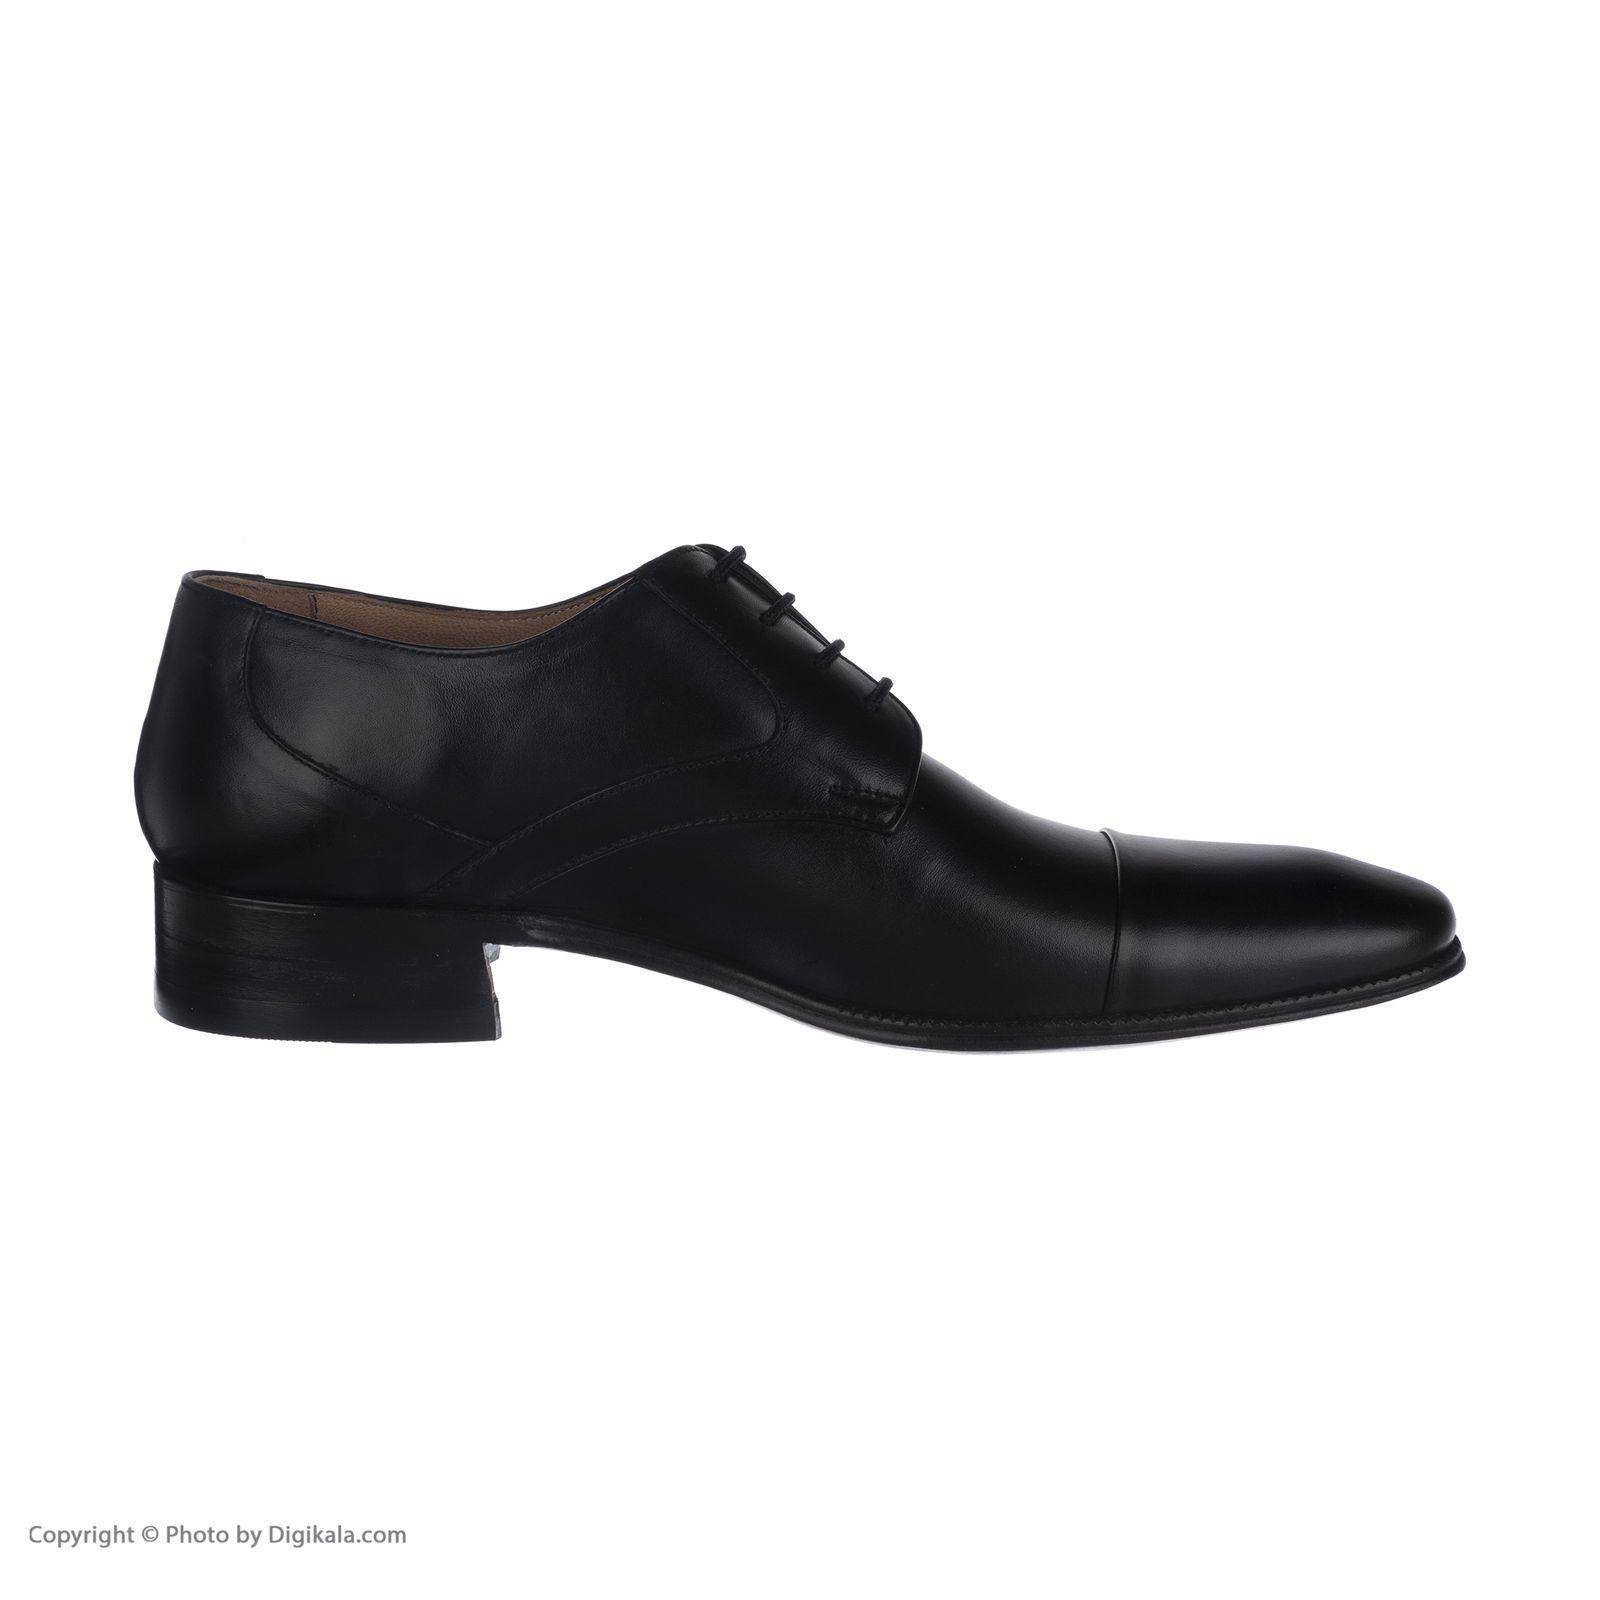 کفش مردانه نظری کد 413 -  - 5